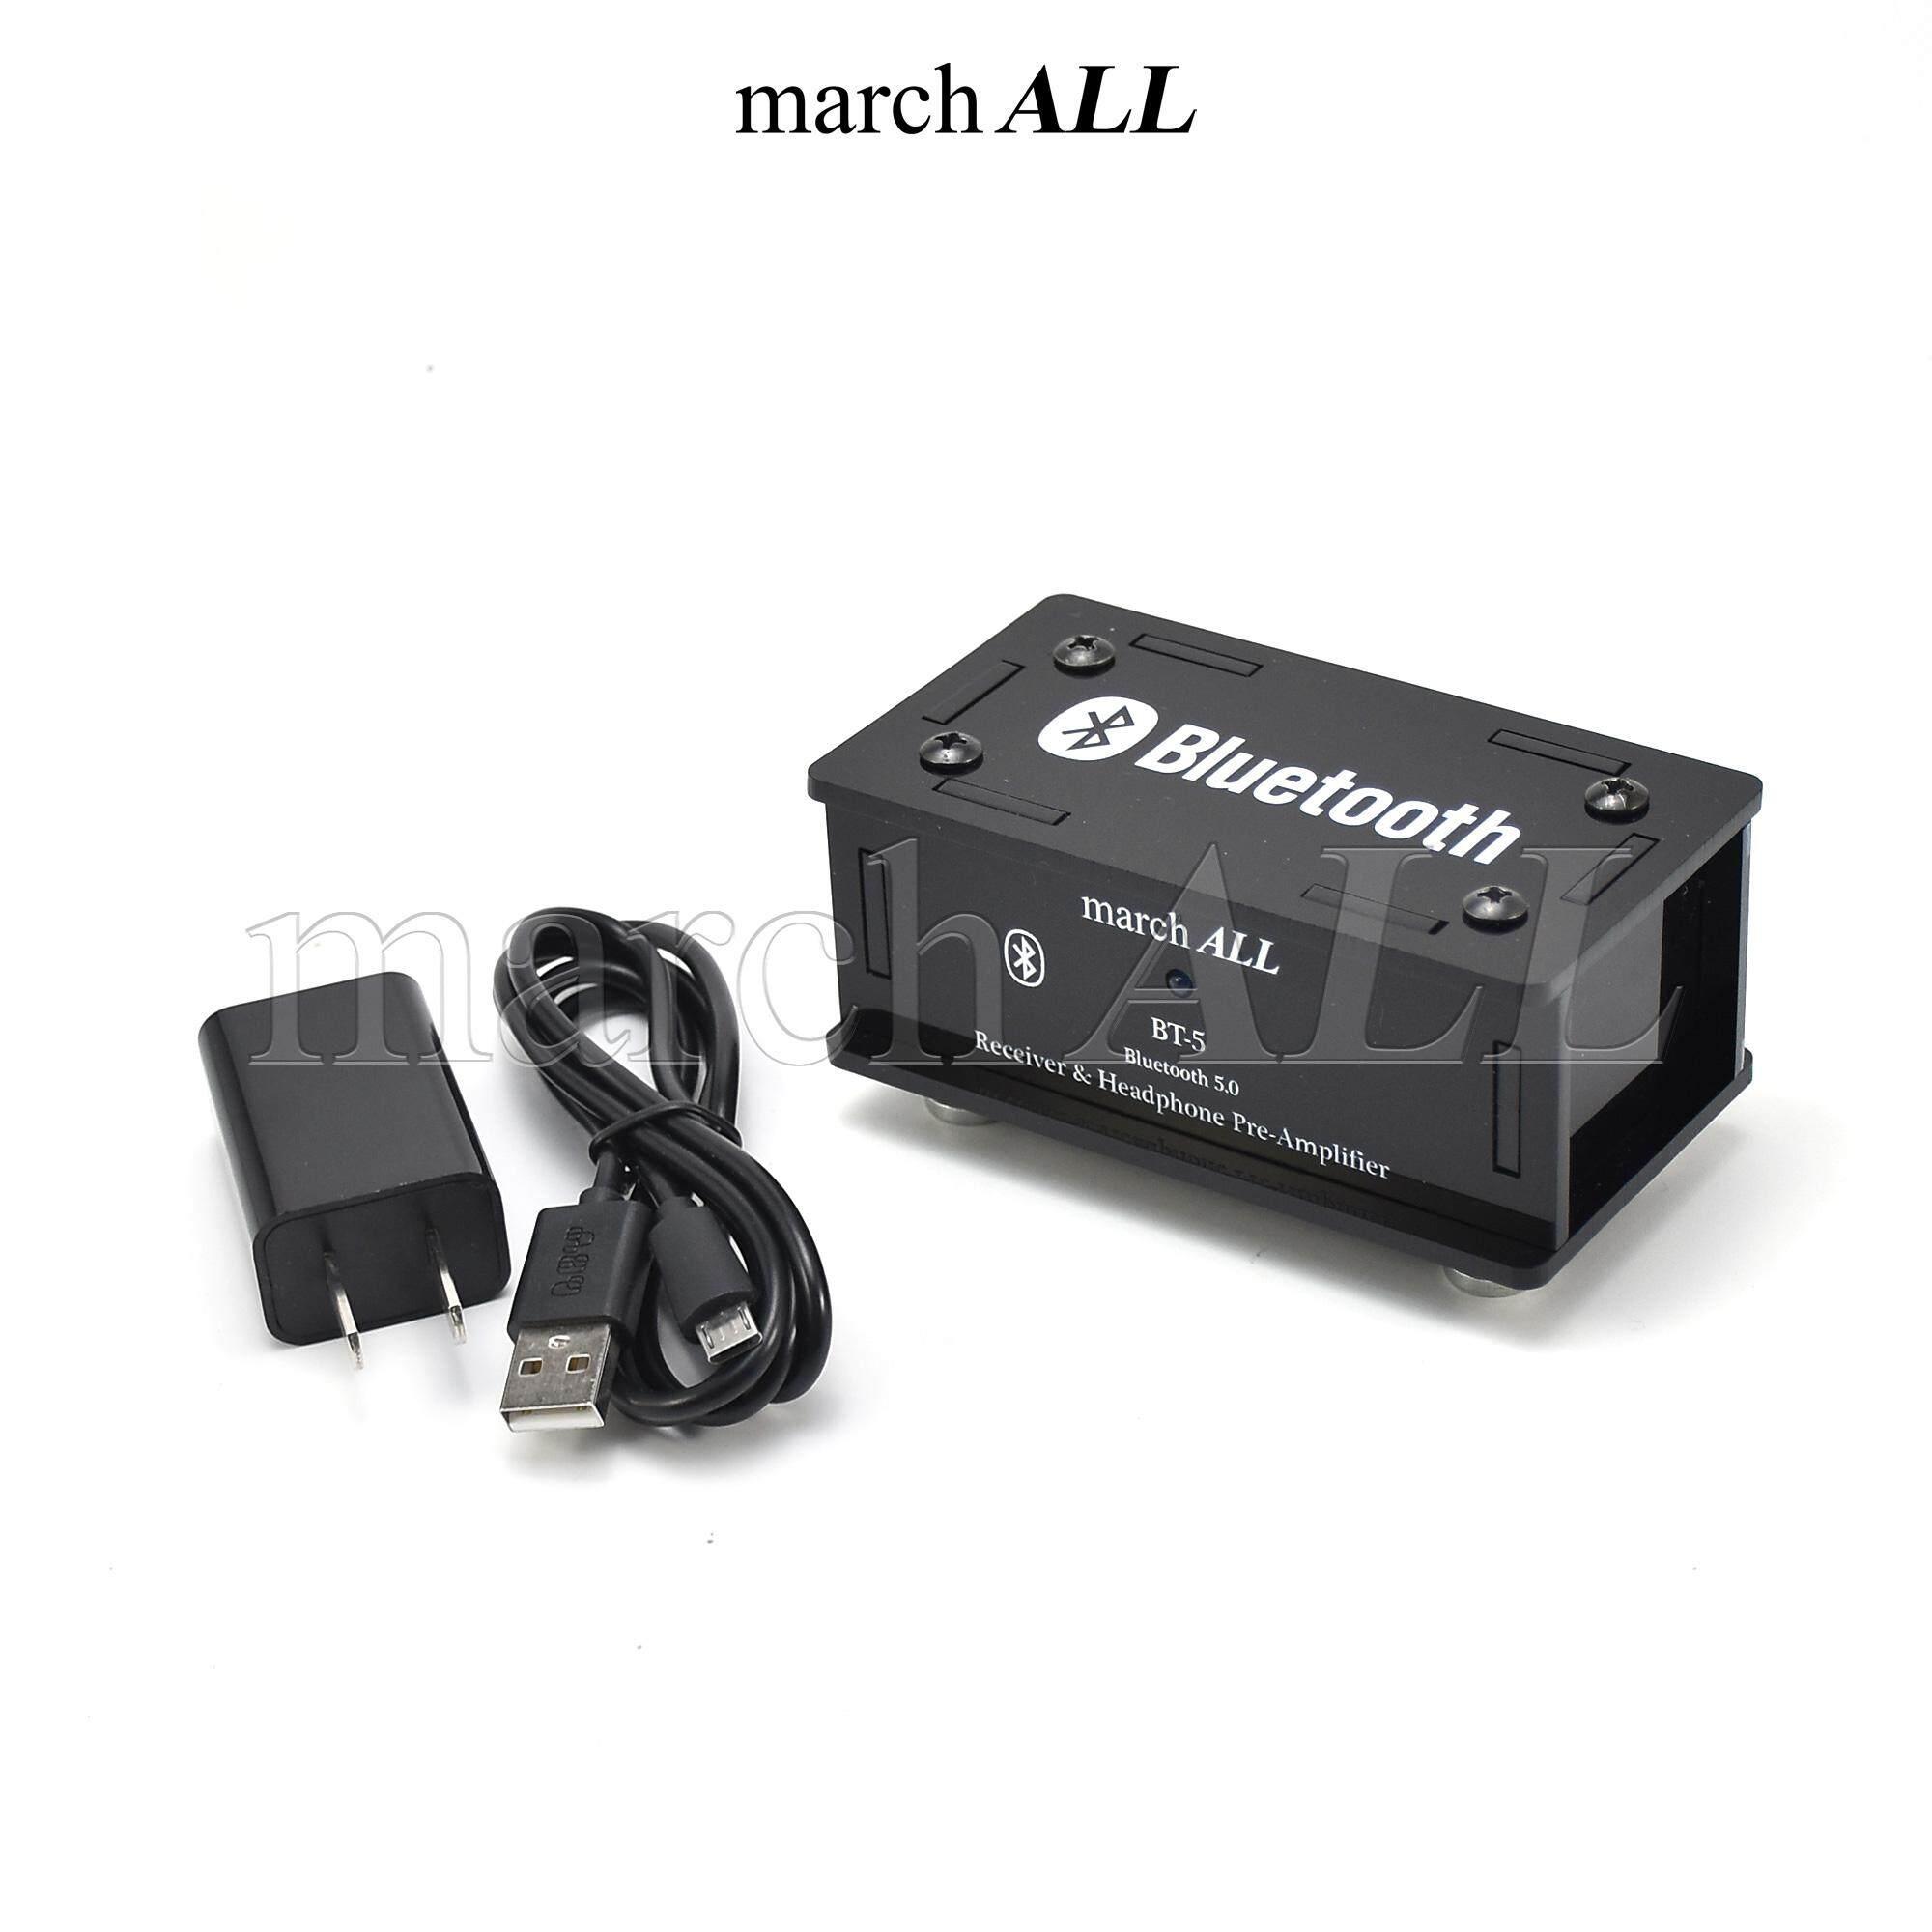 Marchall Bt-5 บลูทูธ 5.0 ตัวรับ สัญญาณ บลูทูธ Bluetooth เสียงชัด ทุ้มดีมาก เบสลึก แหลมใส ติดตั้งง่าย เป็น ใช้เป็น ปรีแอมป์ และ แอมป์ หูฟัง ได้ Headphone Receiver Pre-Amplifier ฟรีอะแดปเตอร์ ใช้งานได้เลย ในบ้าน บนรถ ครบ.